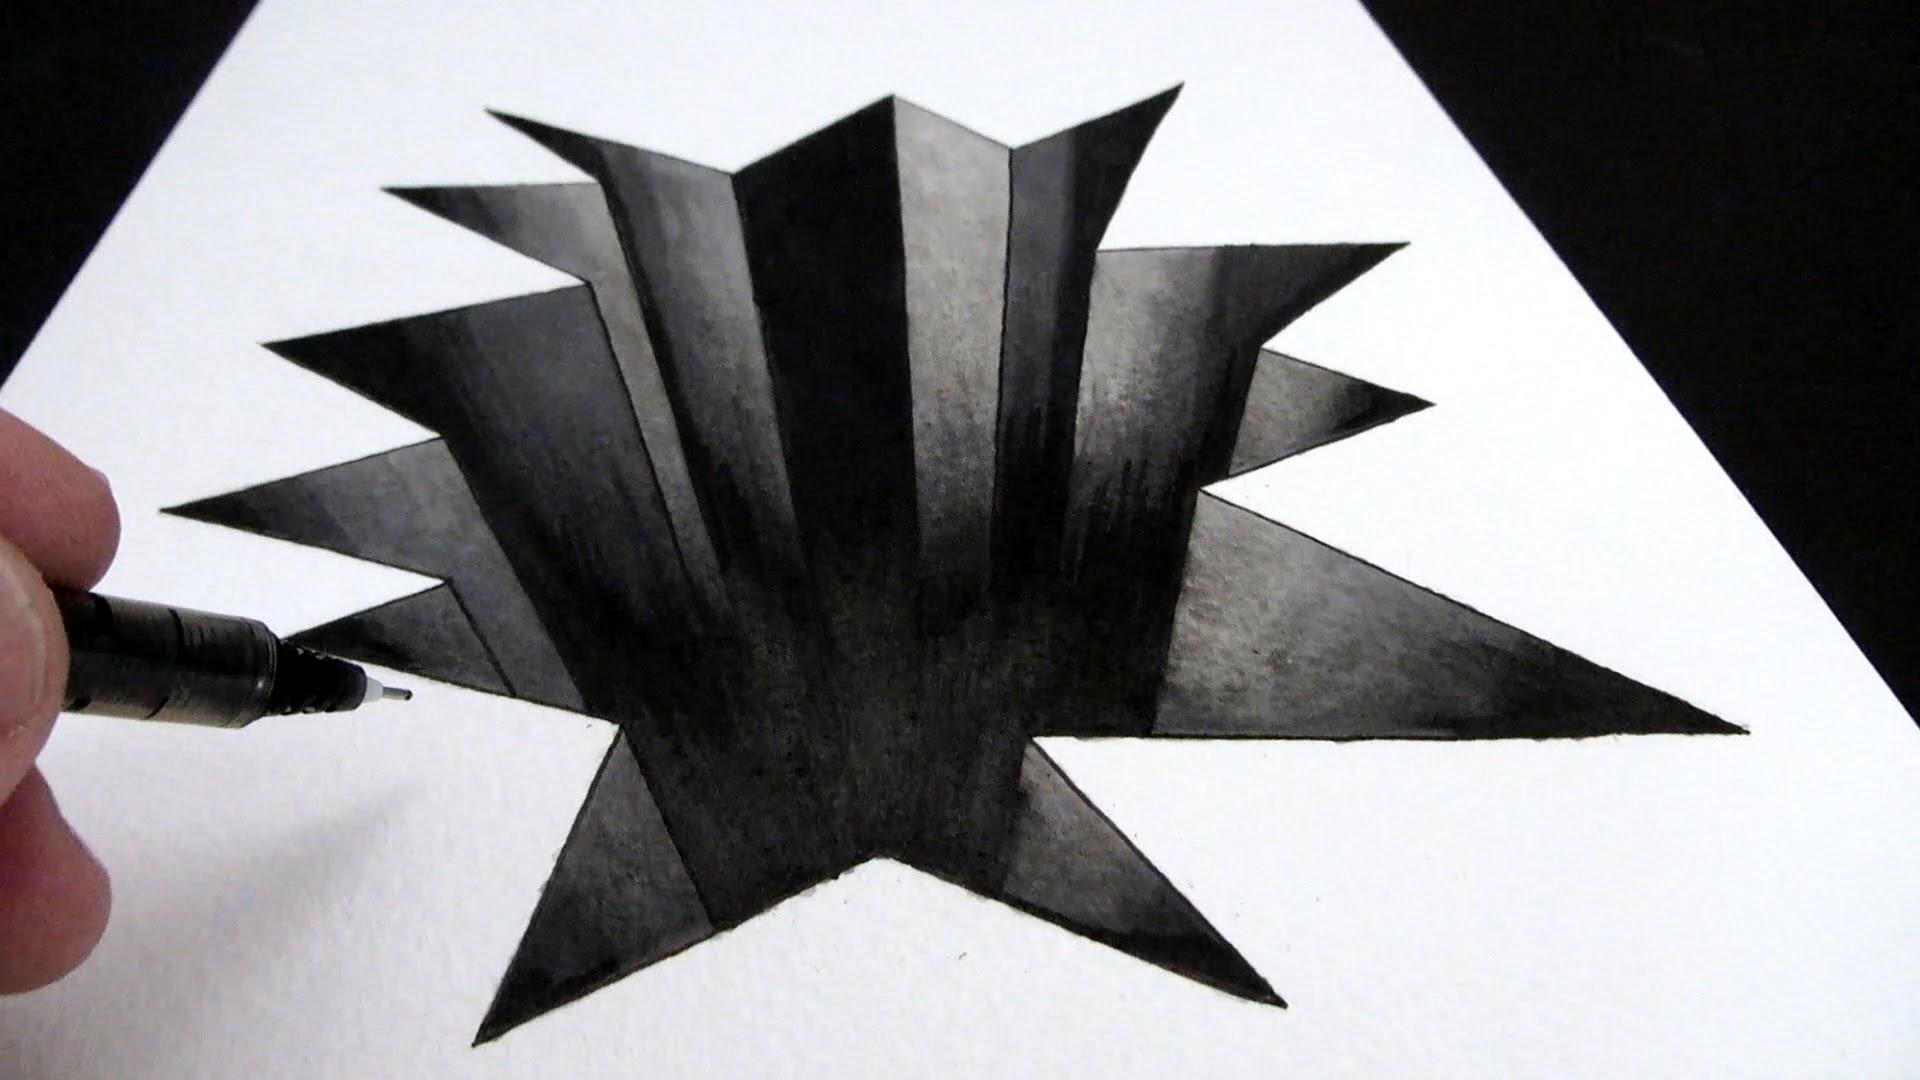 Drawn 3d art epic Draw  Paper: a YouTube